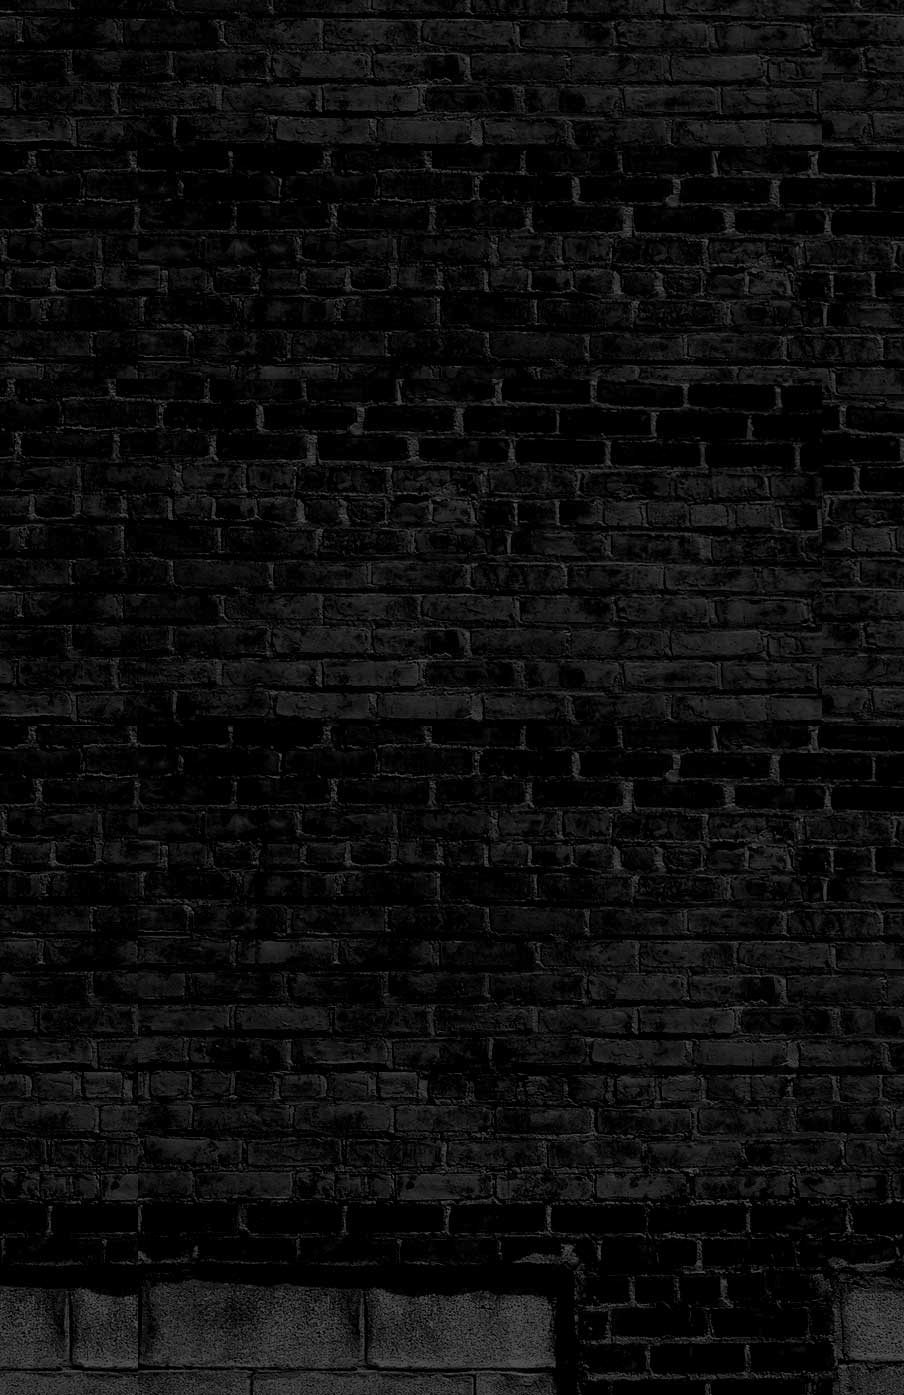 Black Bricks Wallpapers - Wallpaper Cave